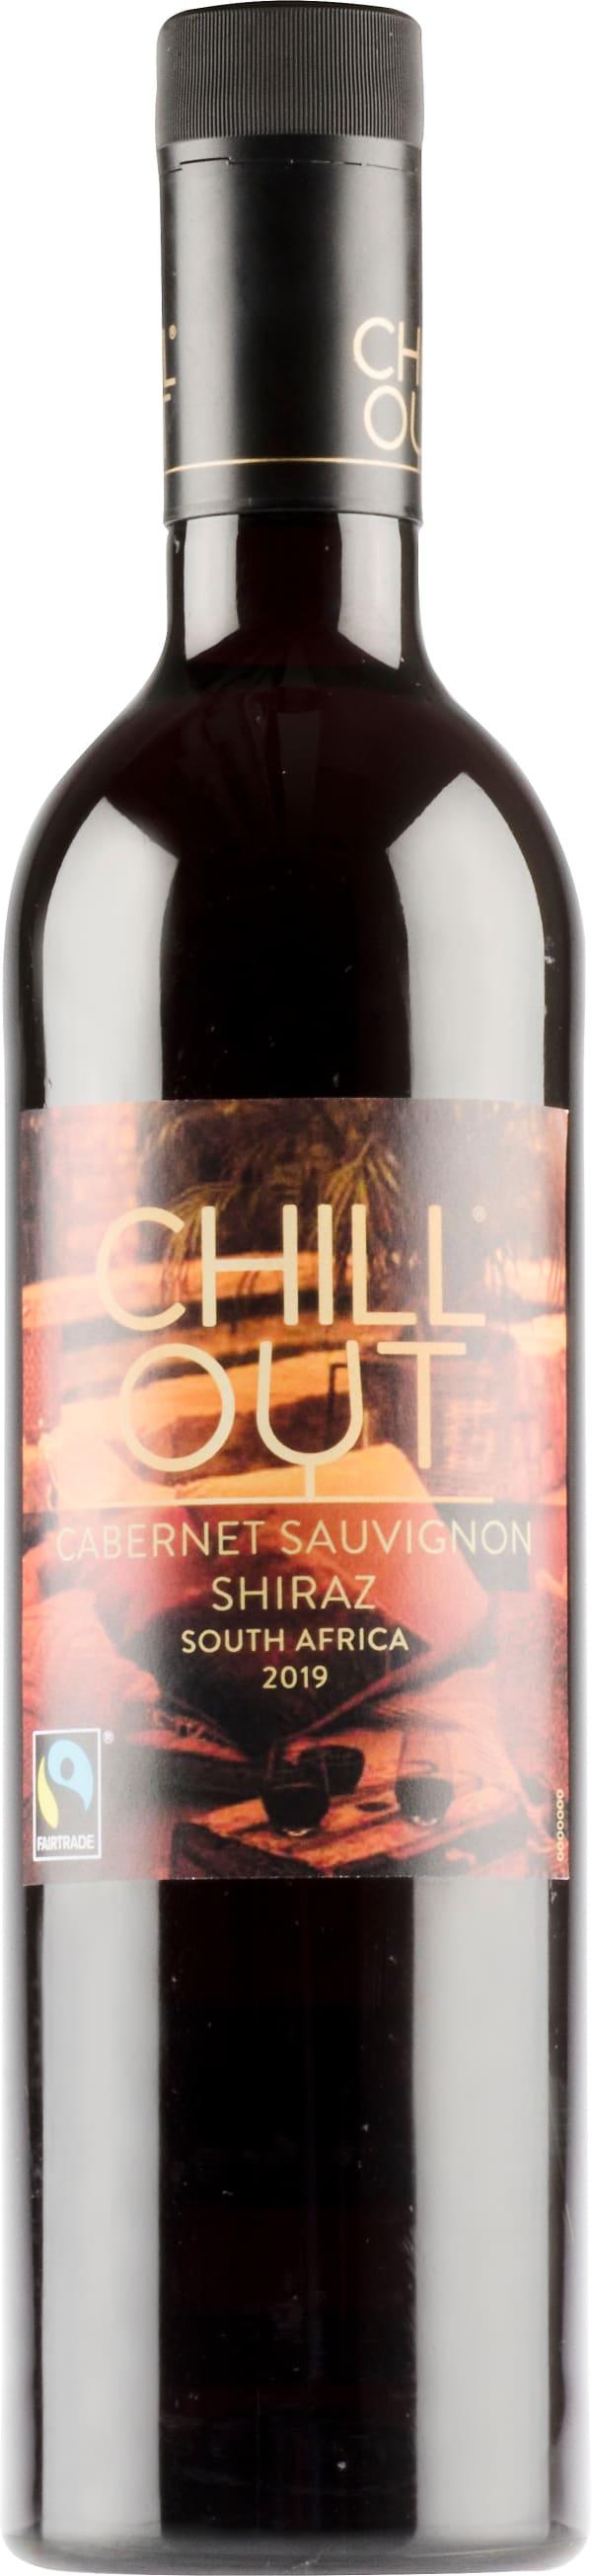 Chill Out Cabernet Sauvignon Shiraz 2019 plastic bottle